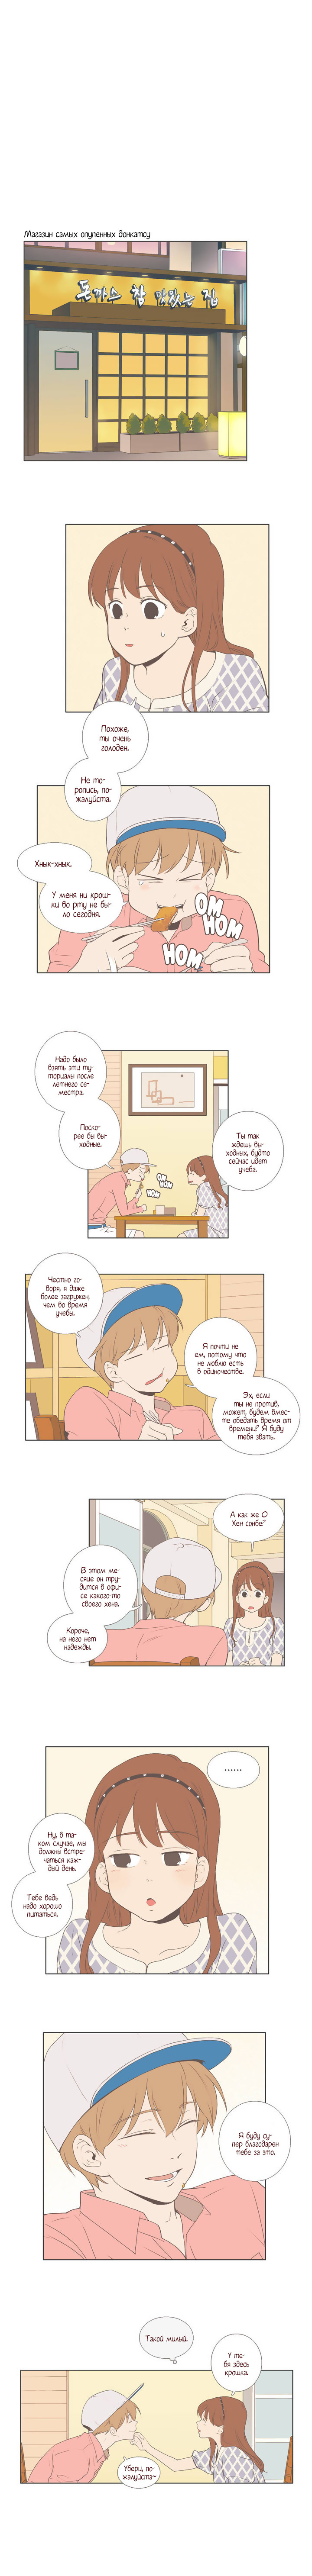 https://r1.ninemanga.com/comics/pic2/12/22860/316659/1484809967641.jpg Page 2